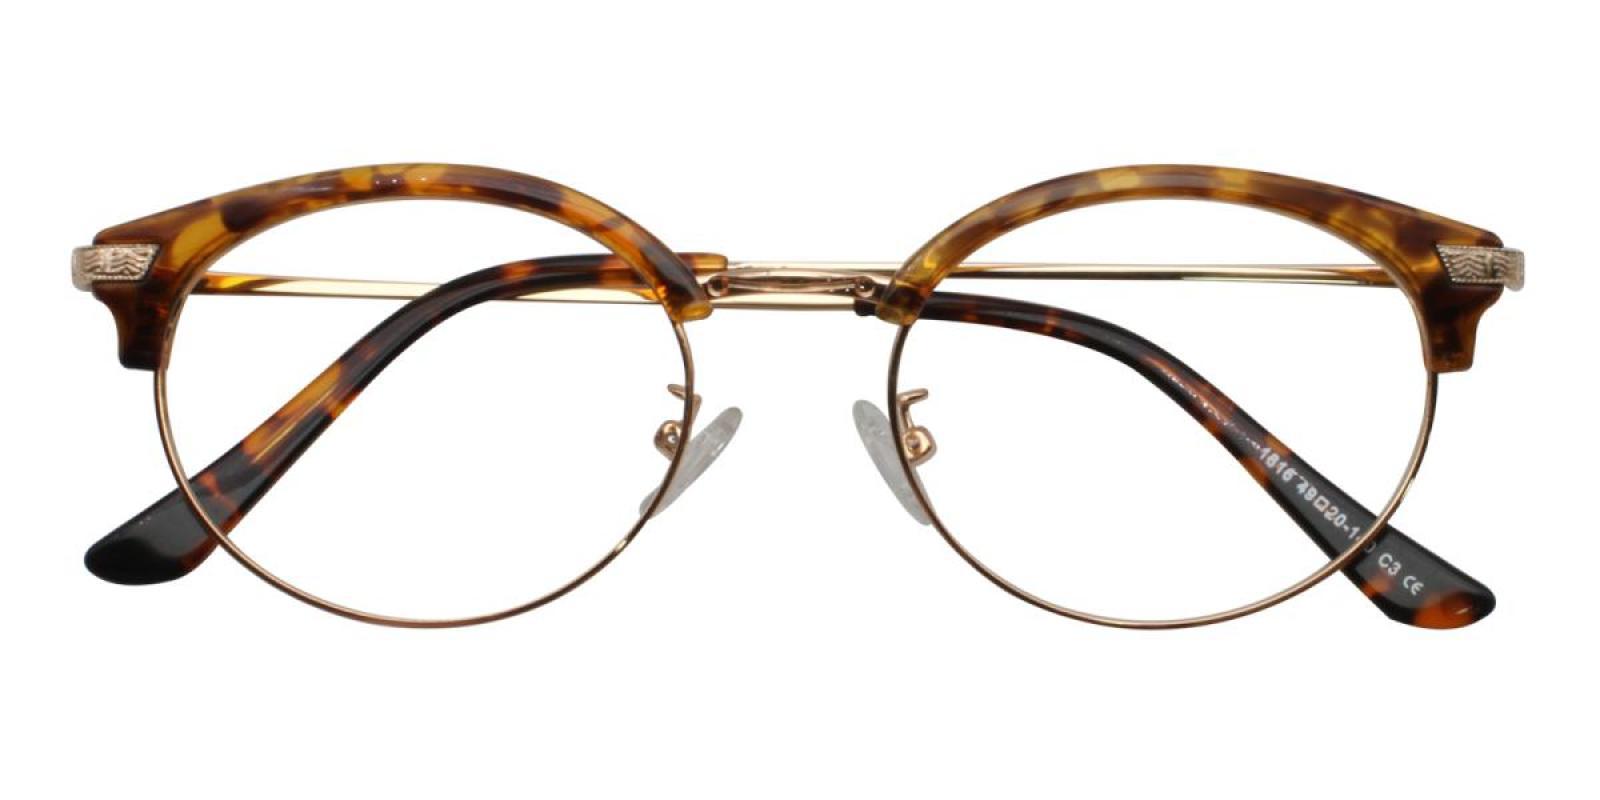 Atlandis-Leopard-Browline-Metal / Combination / TR-Eyeglasses-detail